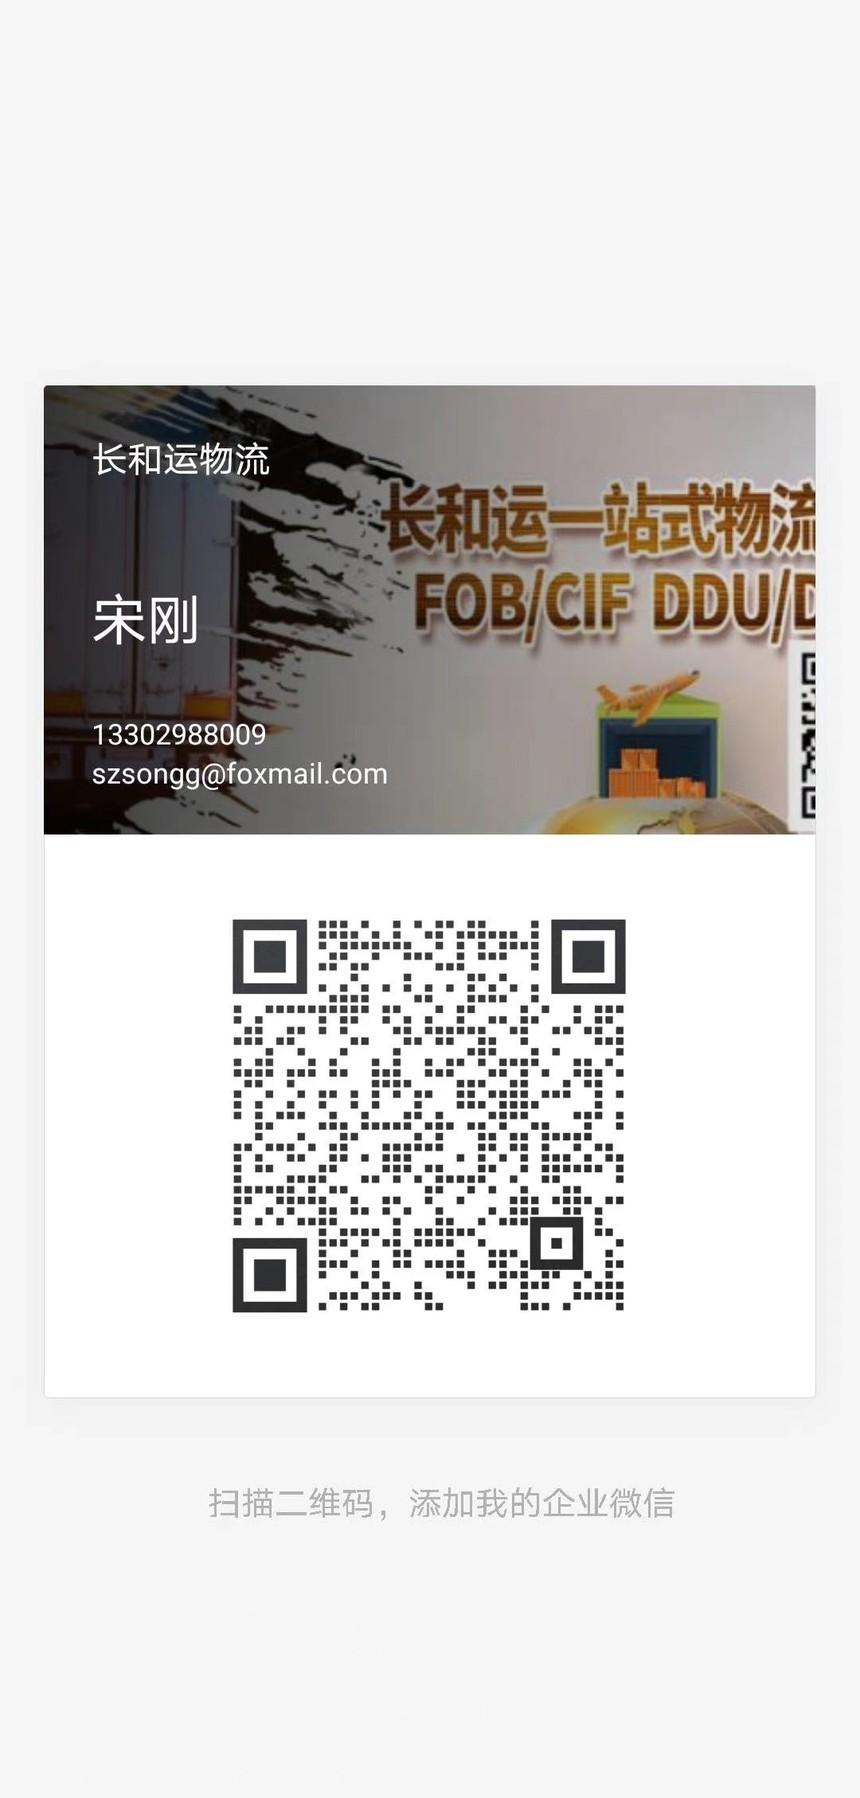 Eric 企业微信二维码.jpg